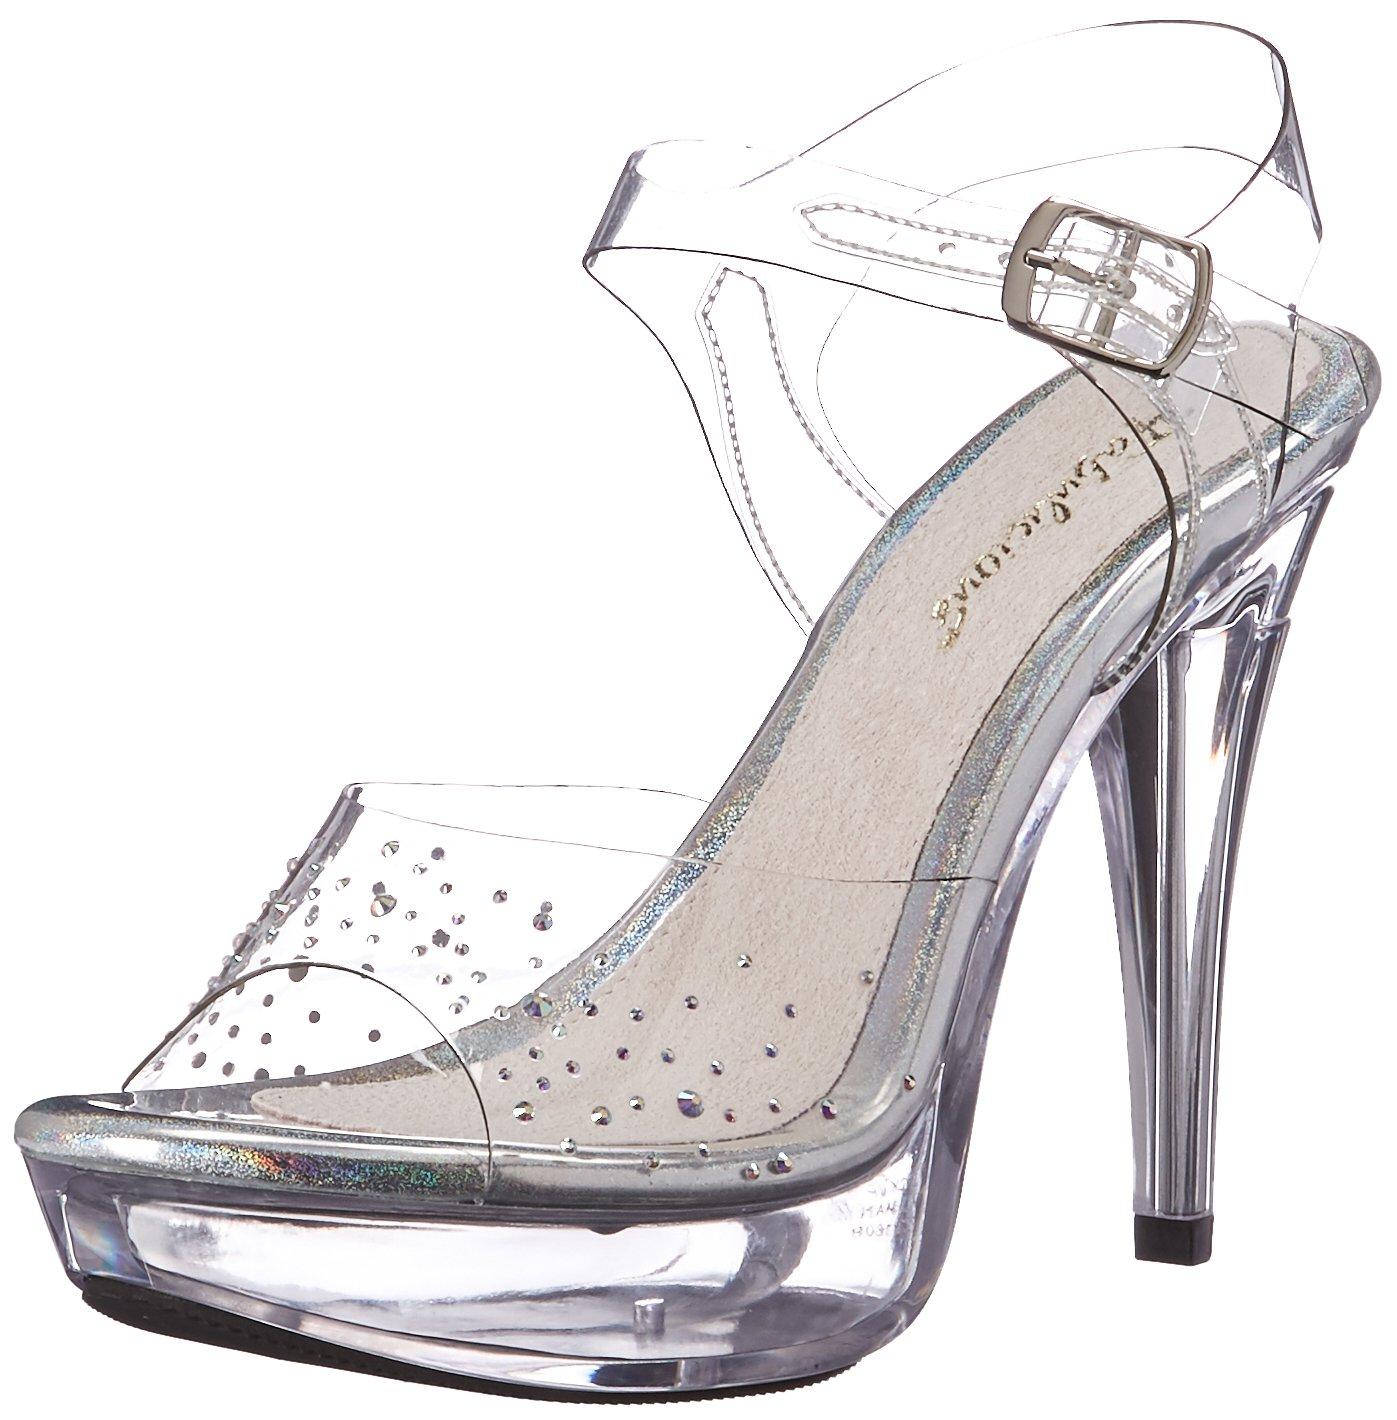 Pleaser Women's Ctail508sd/c/m Platform Sandal B06XGYB18V 6 B(M) US|Clr/Clr